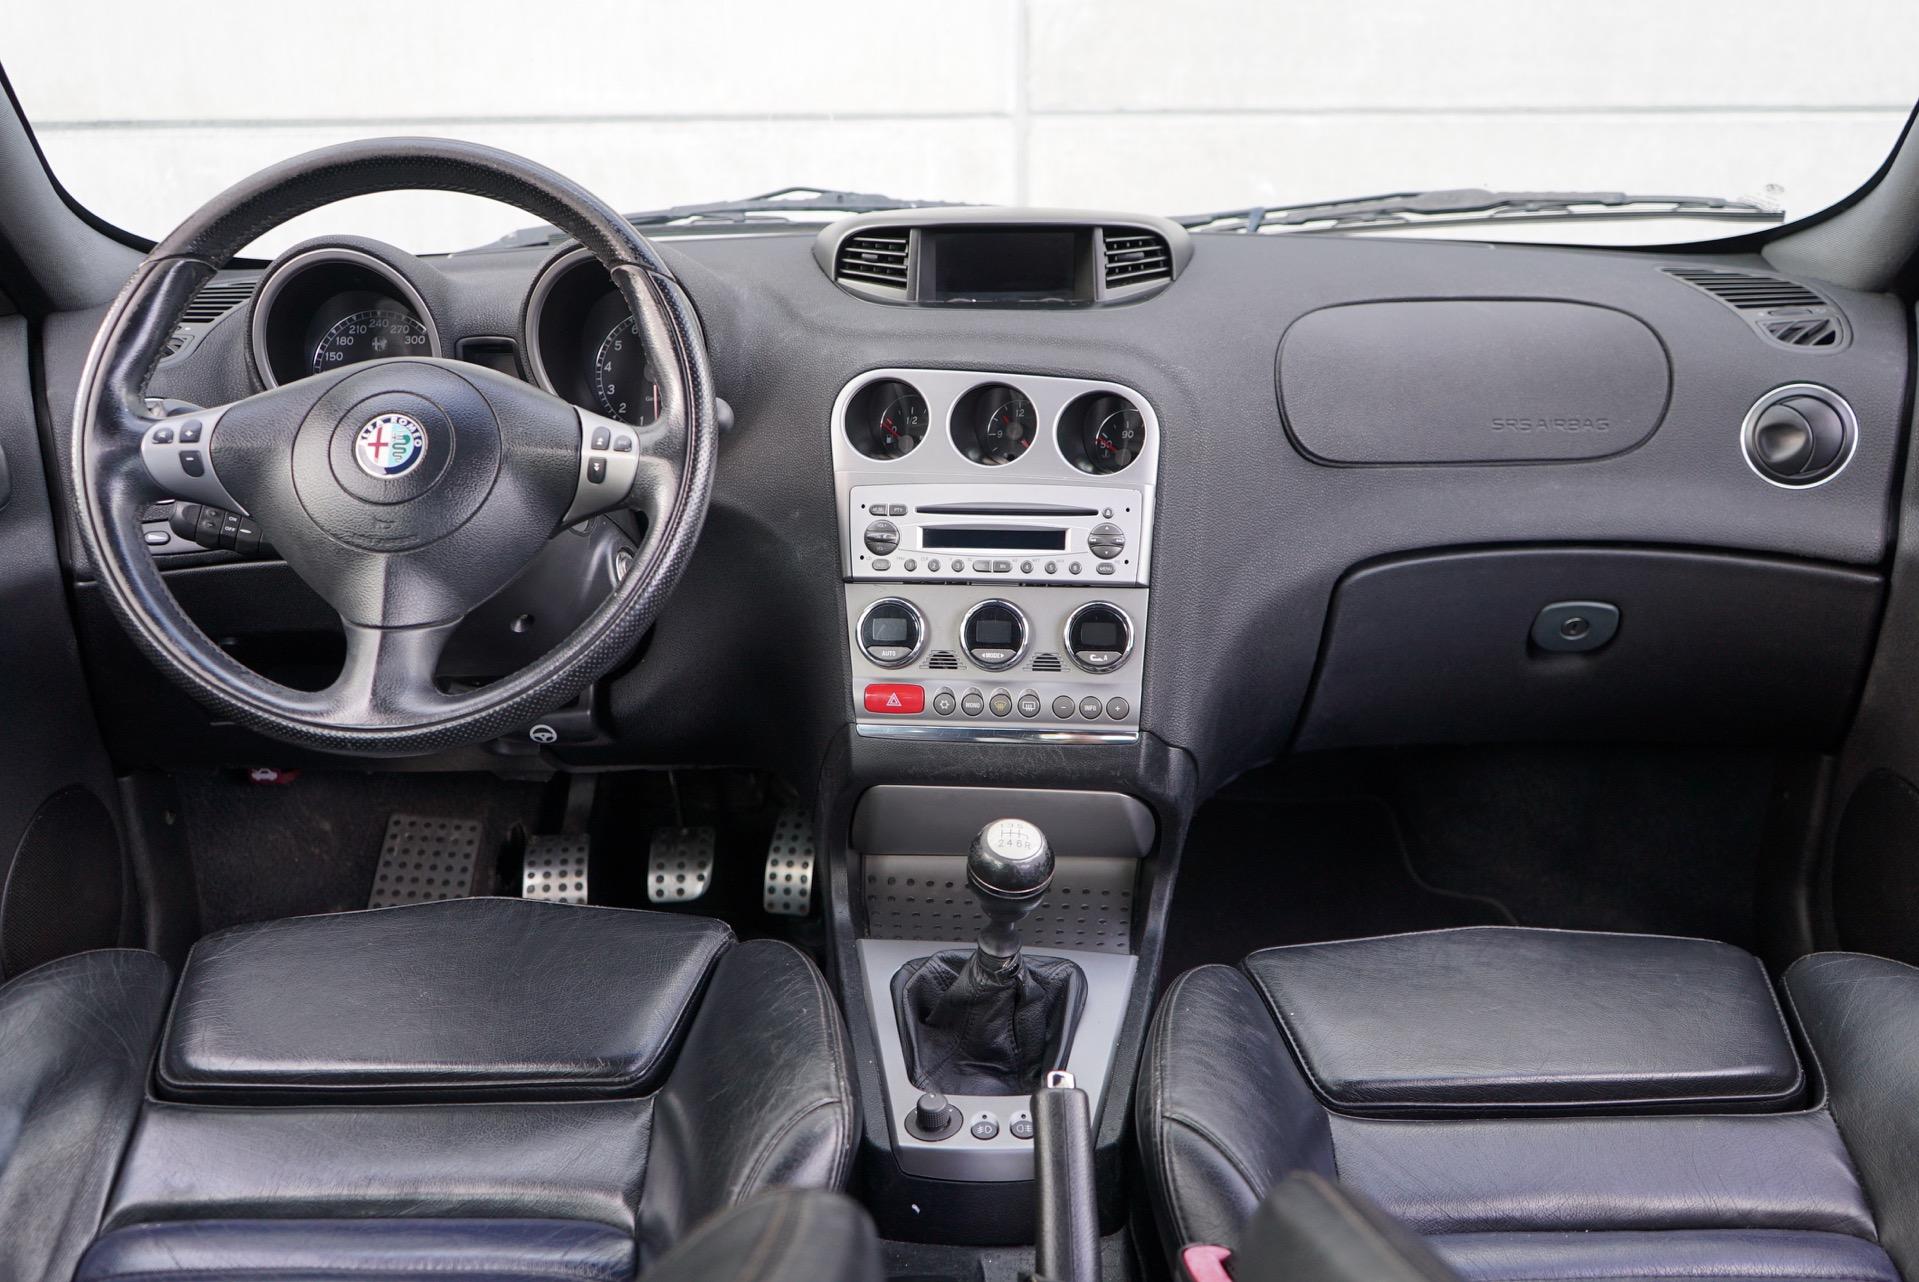 ALFA 156 SPORTWAGON 3.2 V6 GTA